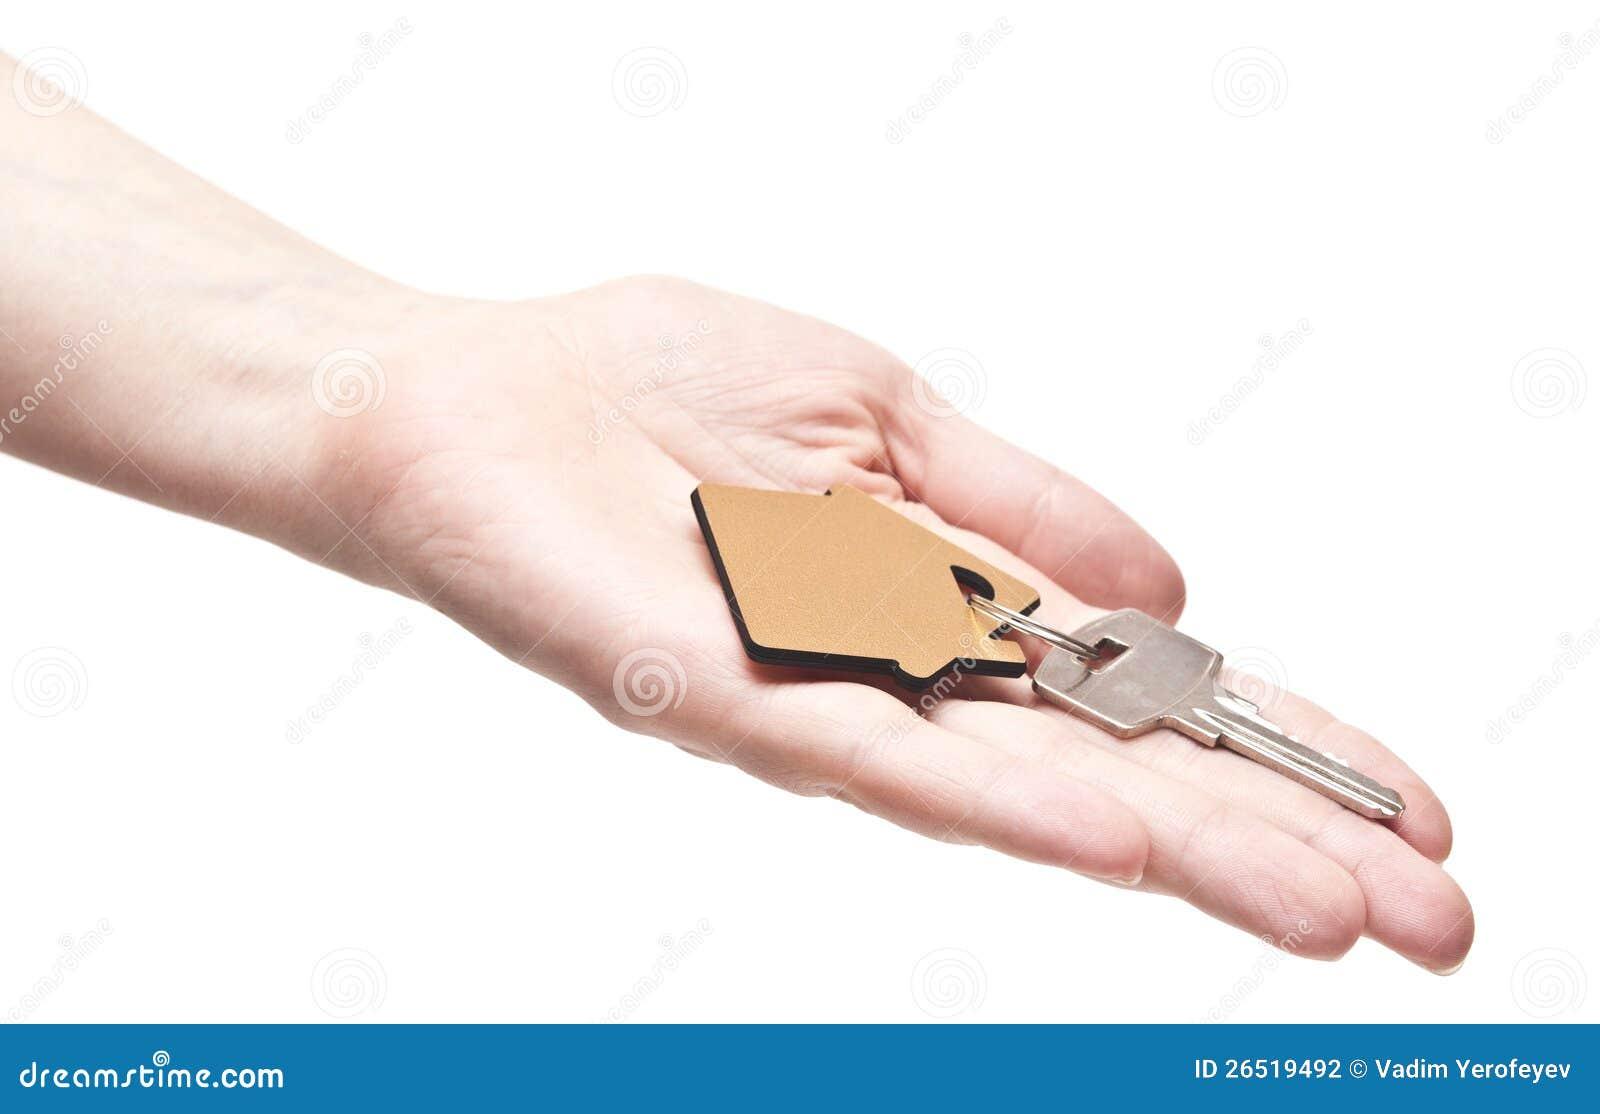 Abrigue chaves na mão fêmea